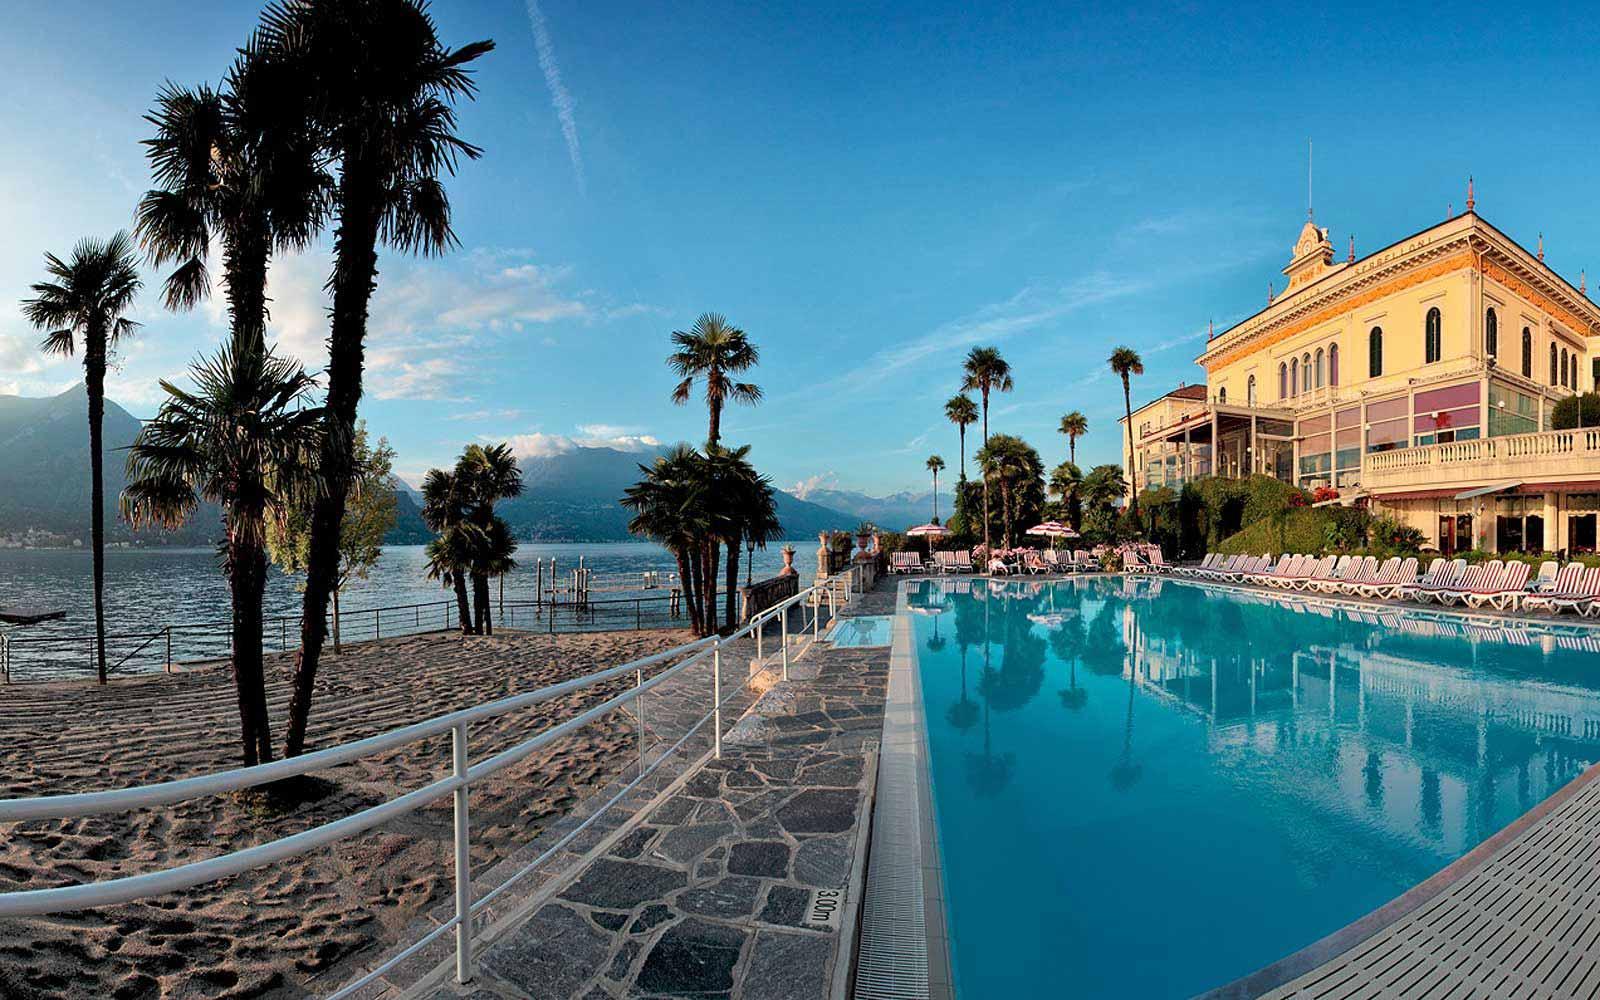 Swimming pool at Grand Hotel Villa Serbelloni